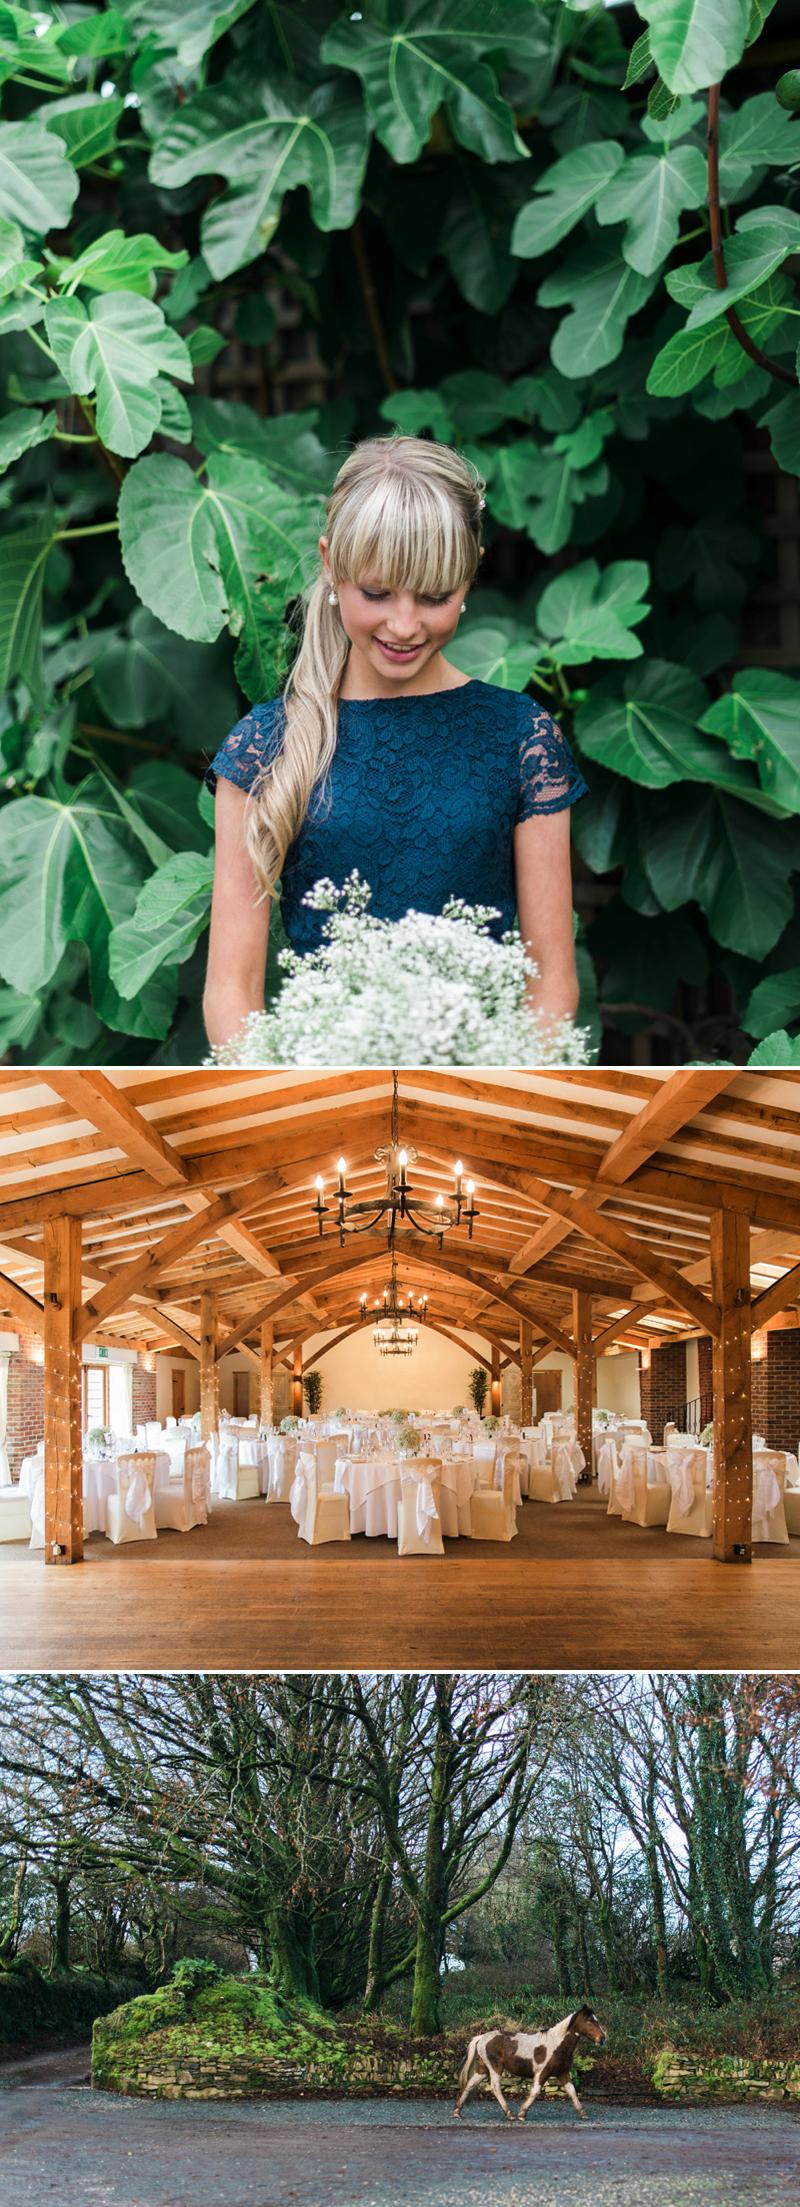 wedding-venue-photography-tips-theresa-furey-photography-coco-wedding-venues-004